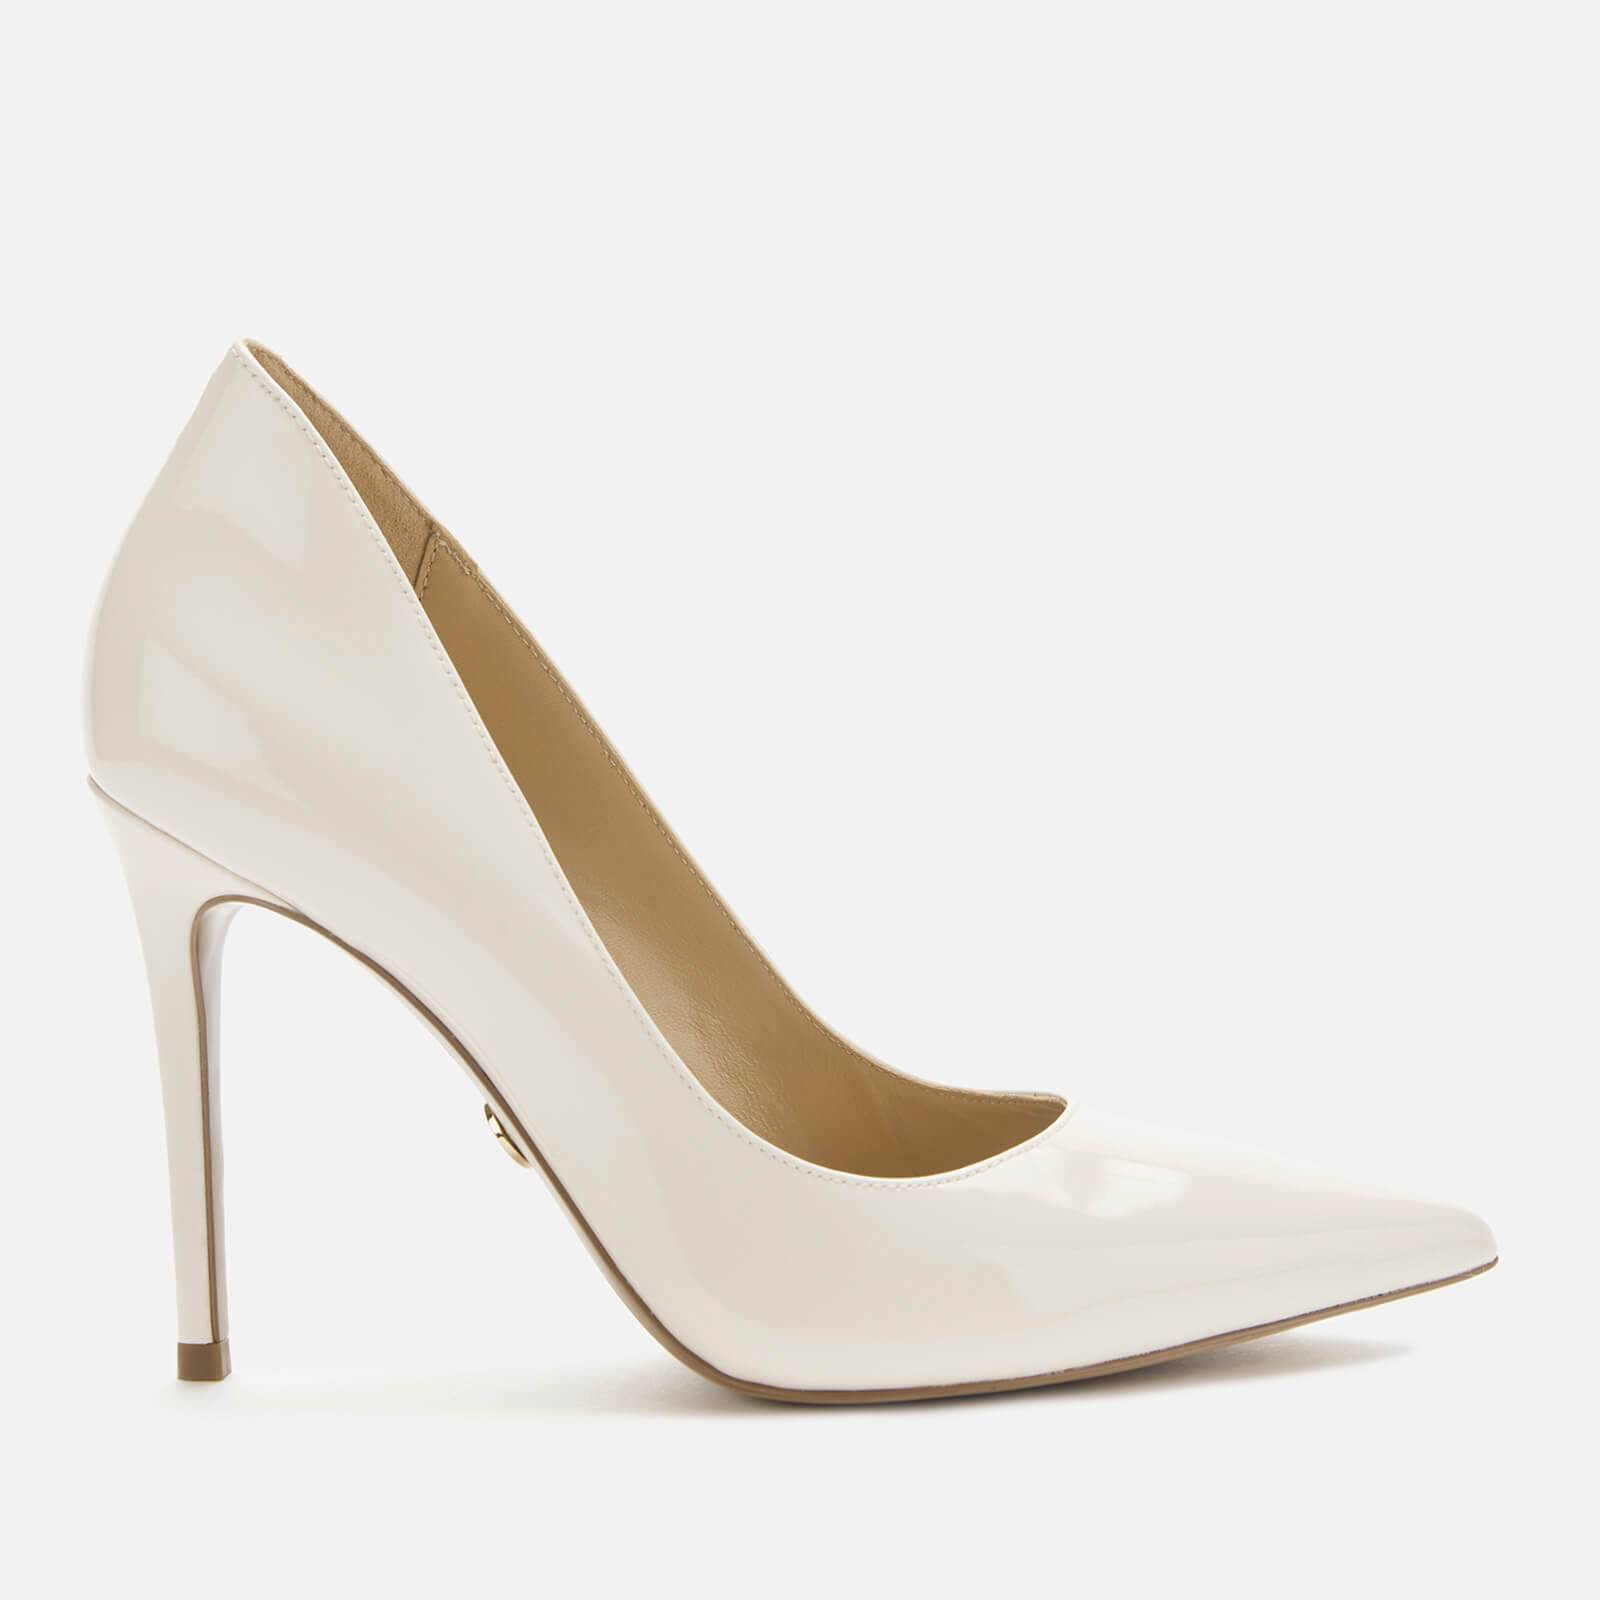 MICHAEL MICHAEL KORS Women's Keke Patent Leather Court Shoes - Light Cream - UK 4/US 7